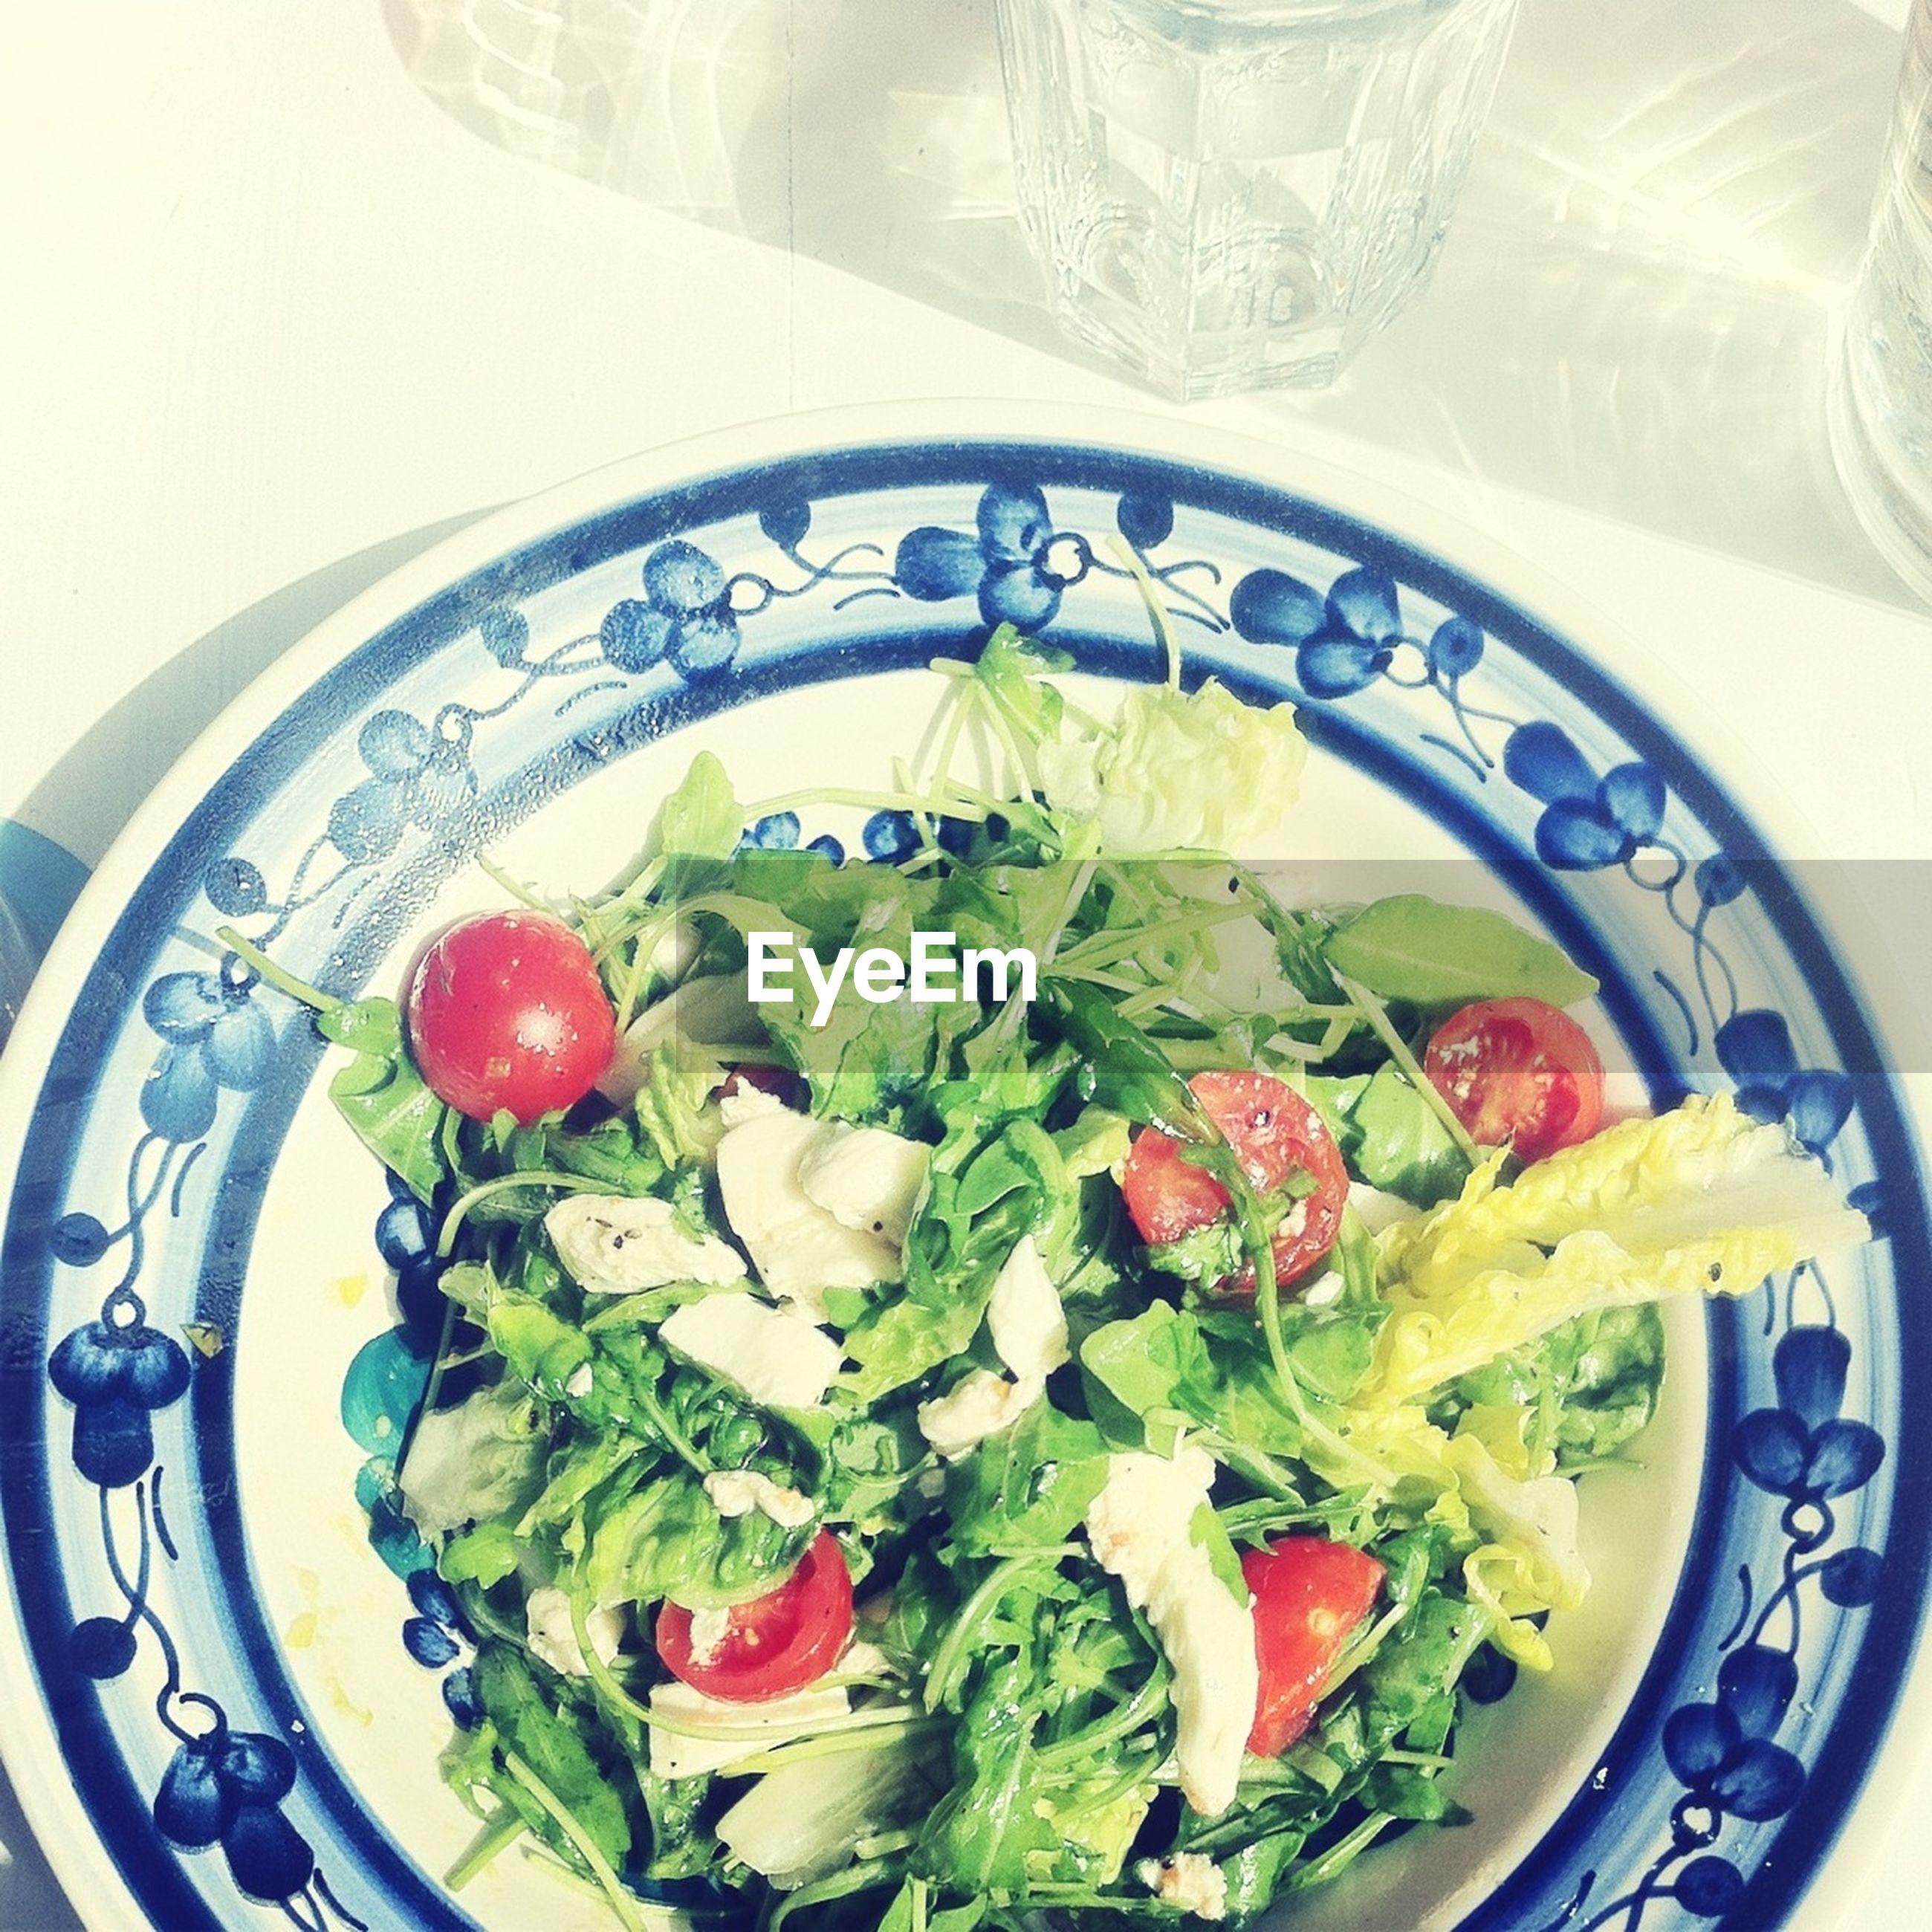 Overhead view of salad